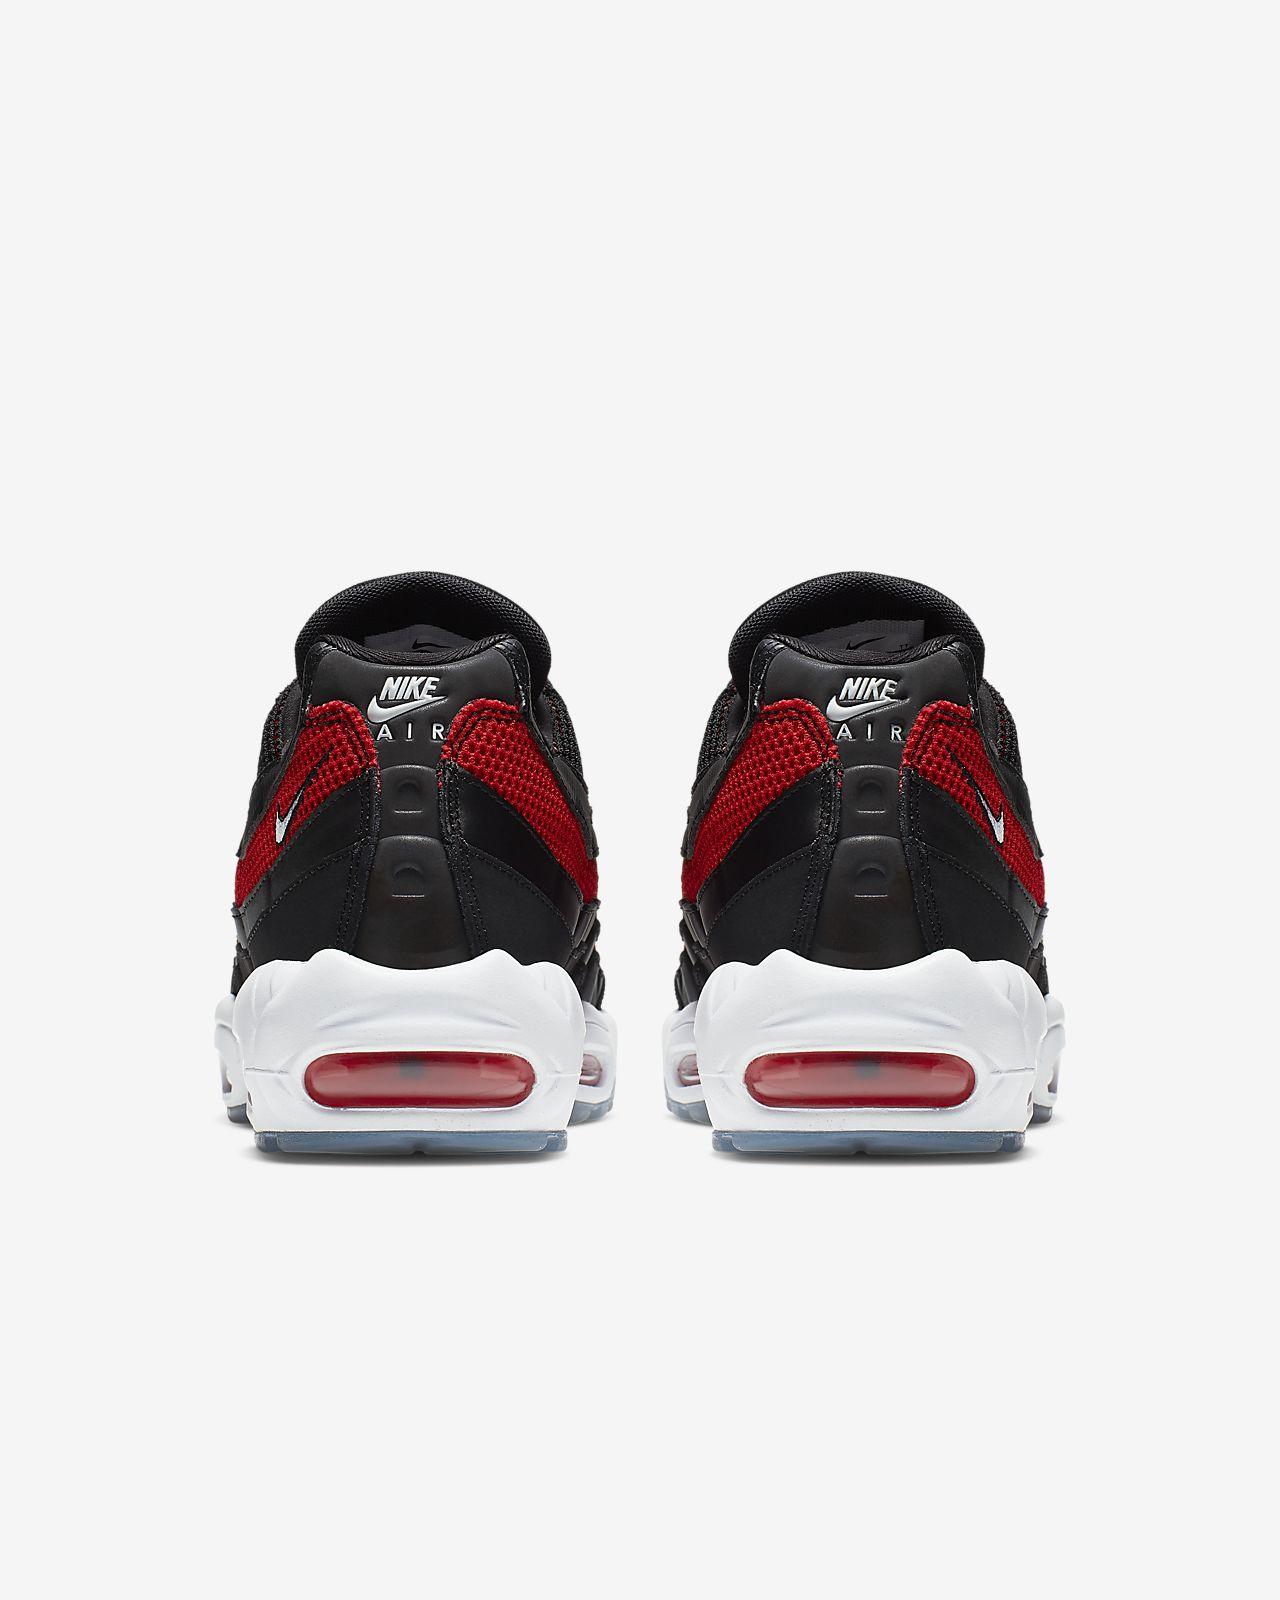 newest 6cba1 a6fbc ... Nike Air Max 95 Essential Zapatillas - Hombre